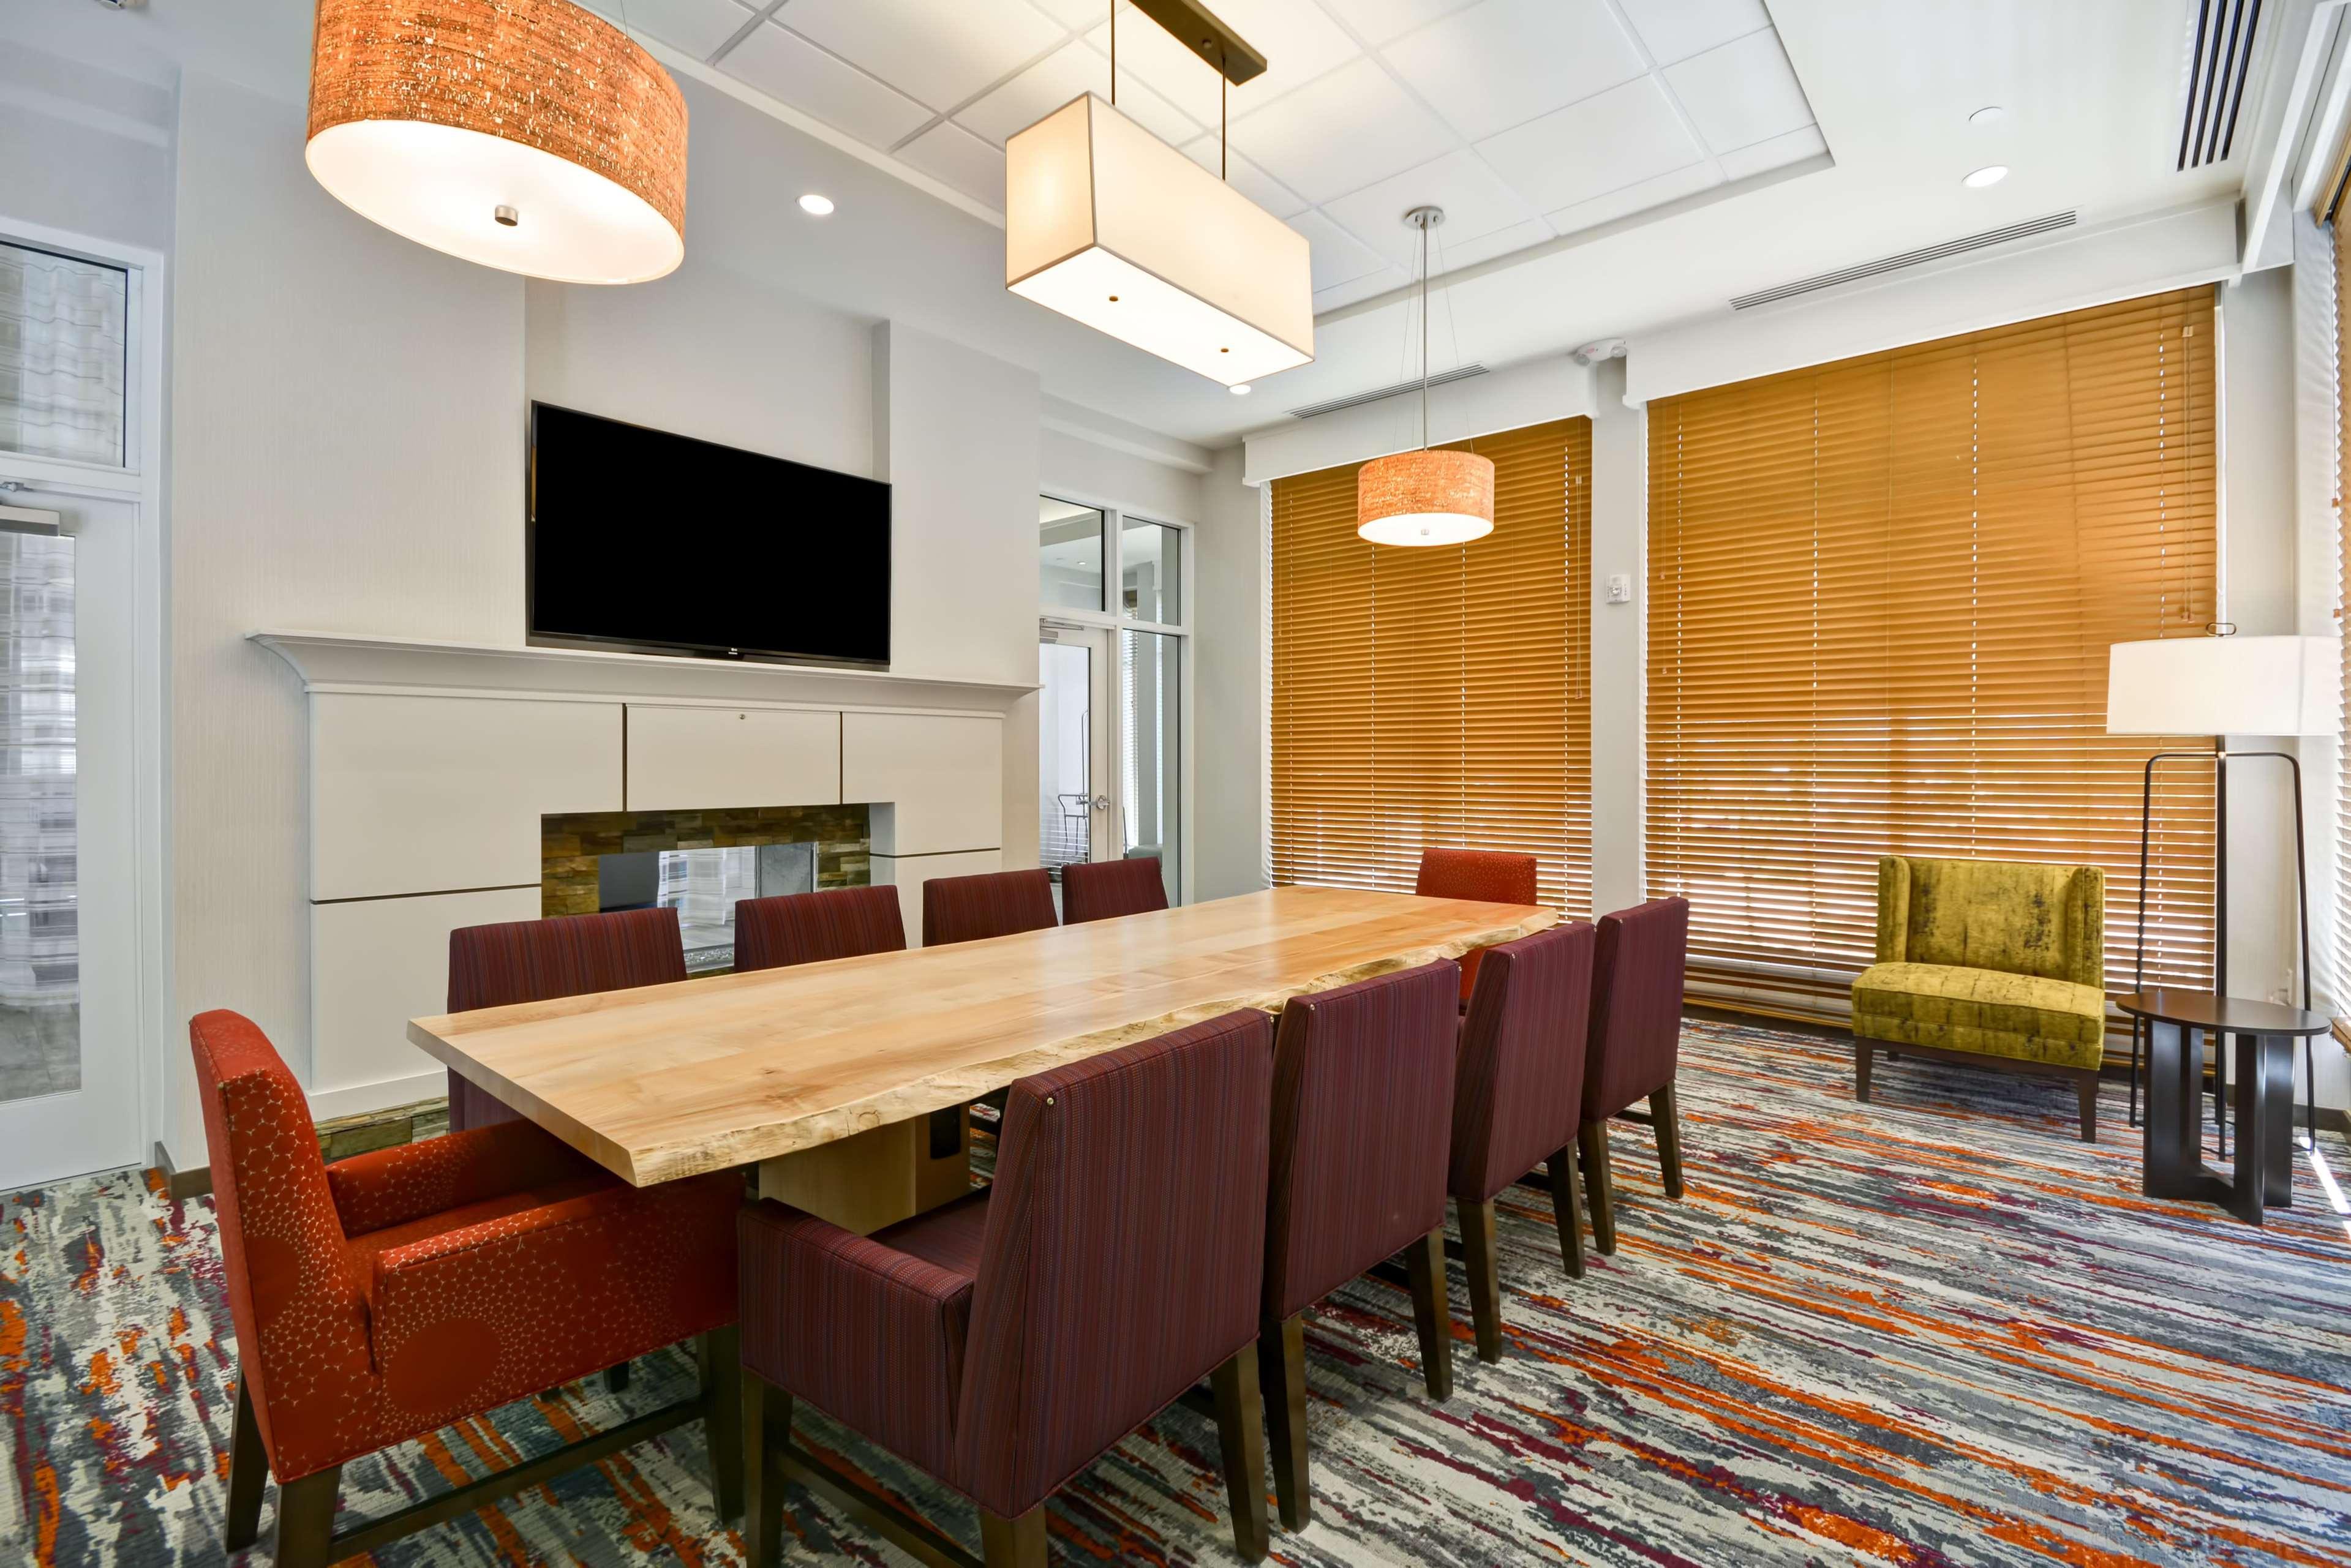 Hilton Garden Inn Phoenix/Tempe ASU Area image 5